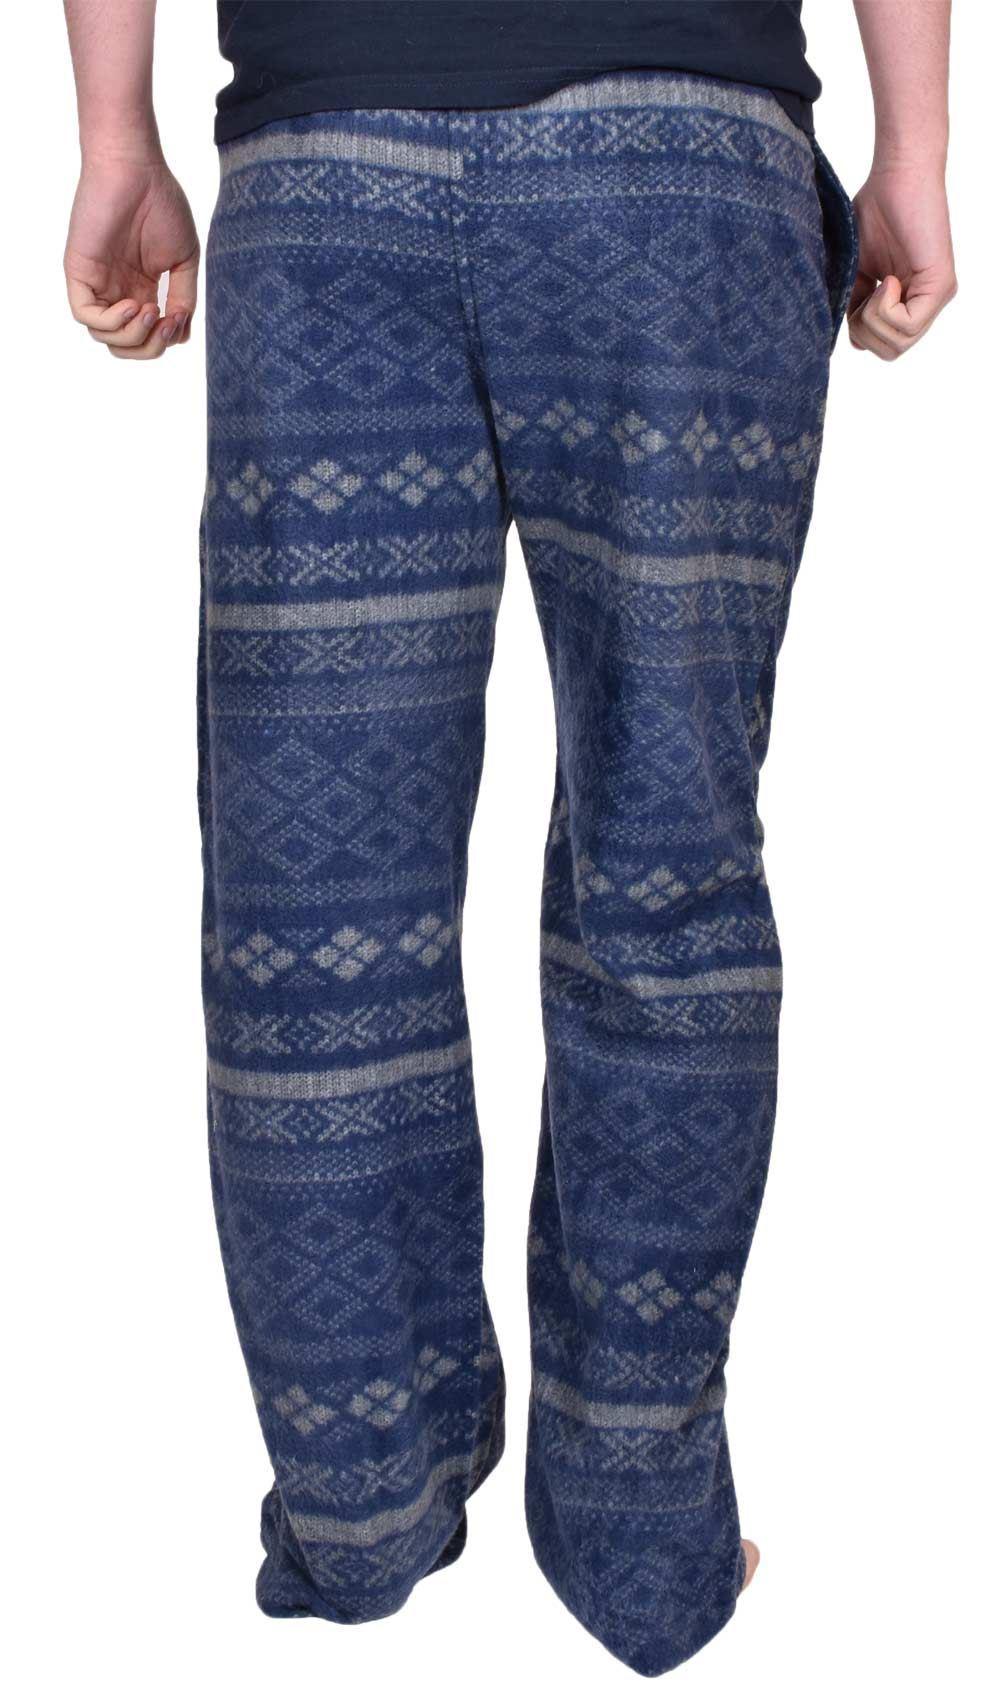 Mens-Women-Plain-Fleece-Joggers-Bottoms-Jogging-Pant-Gym-Fitness-Sports-Trousers thumbnail 14